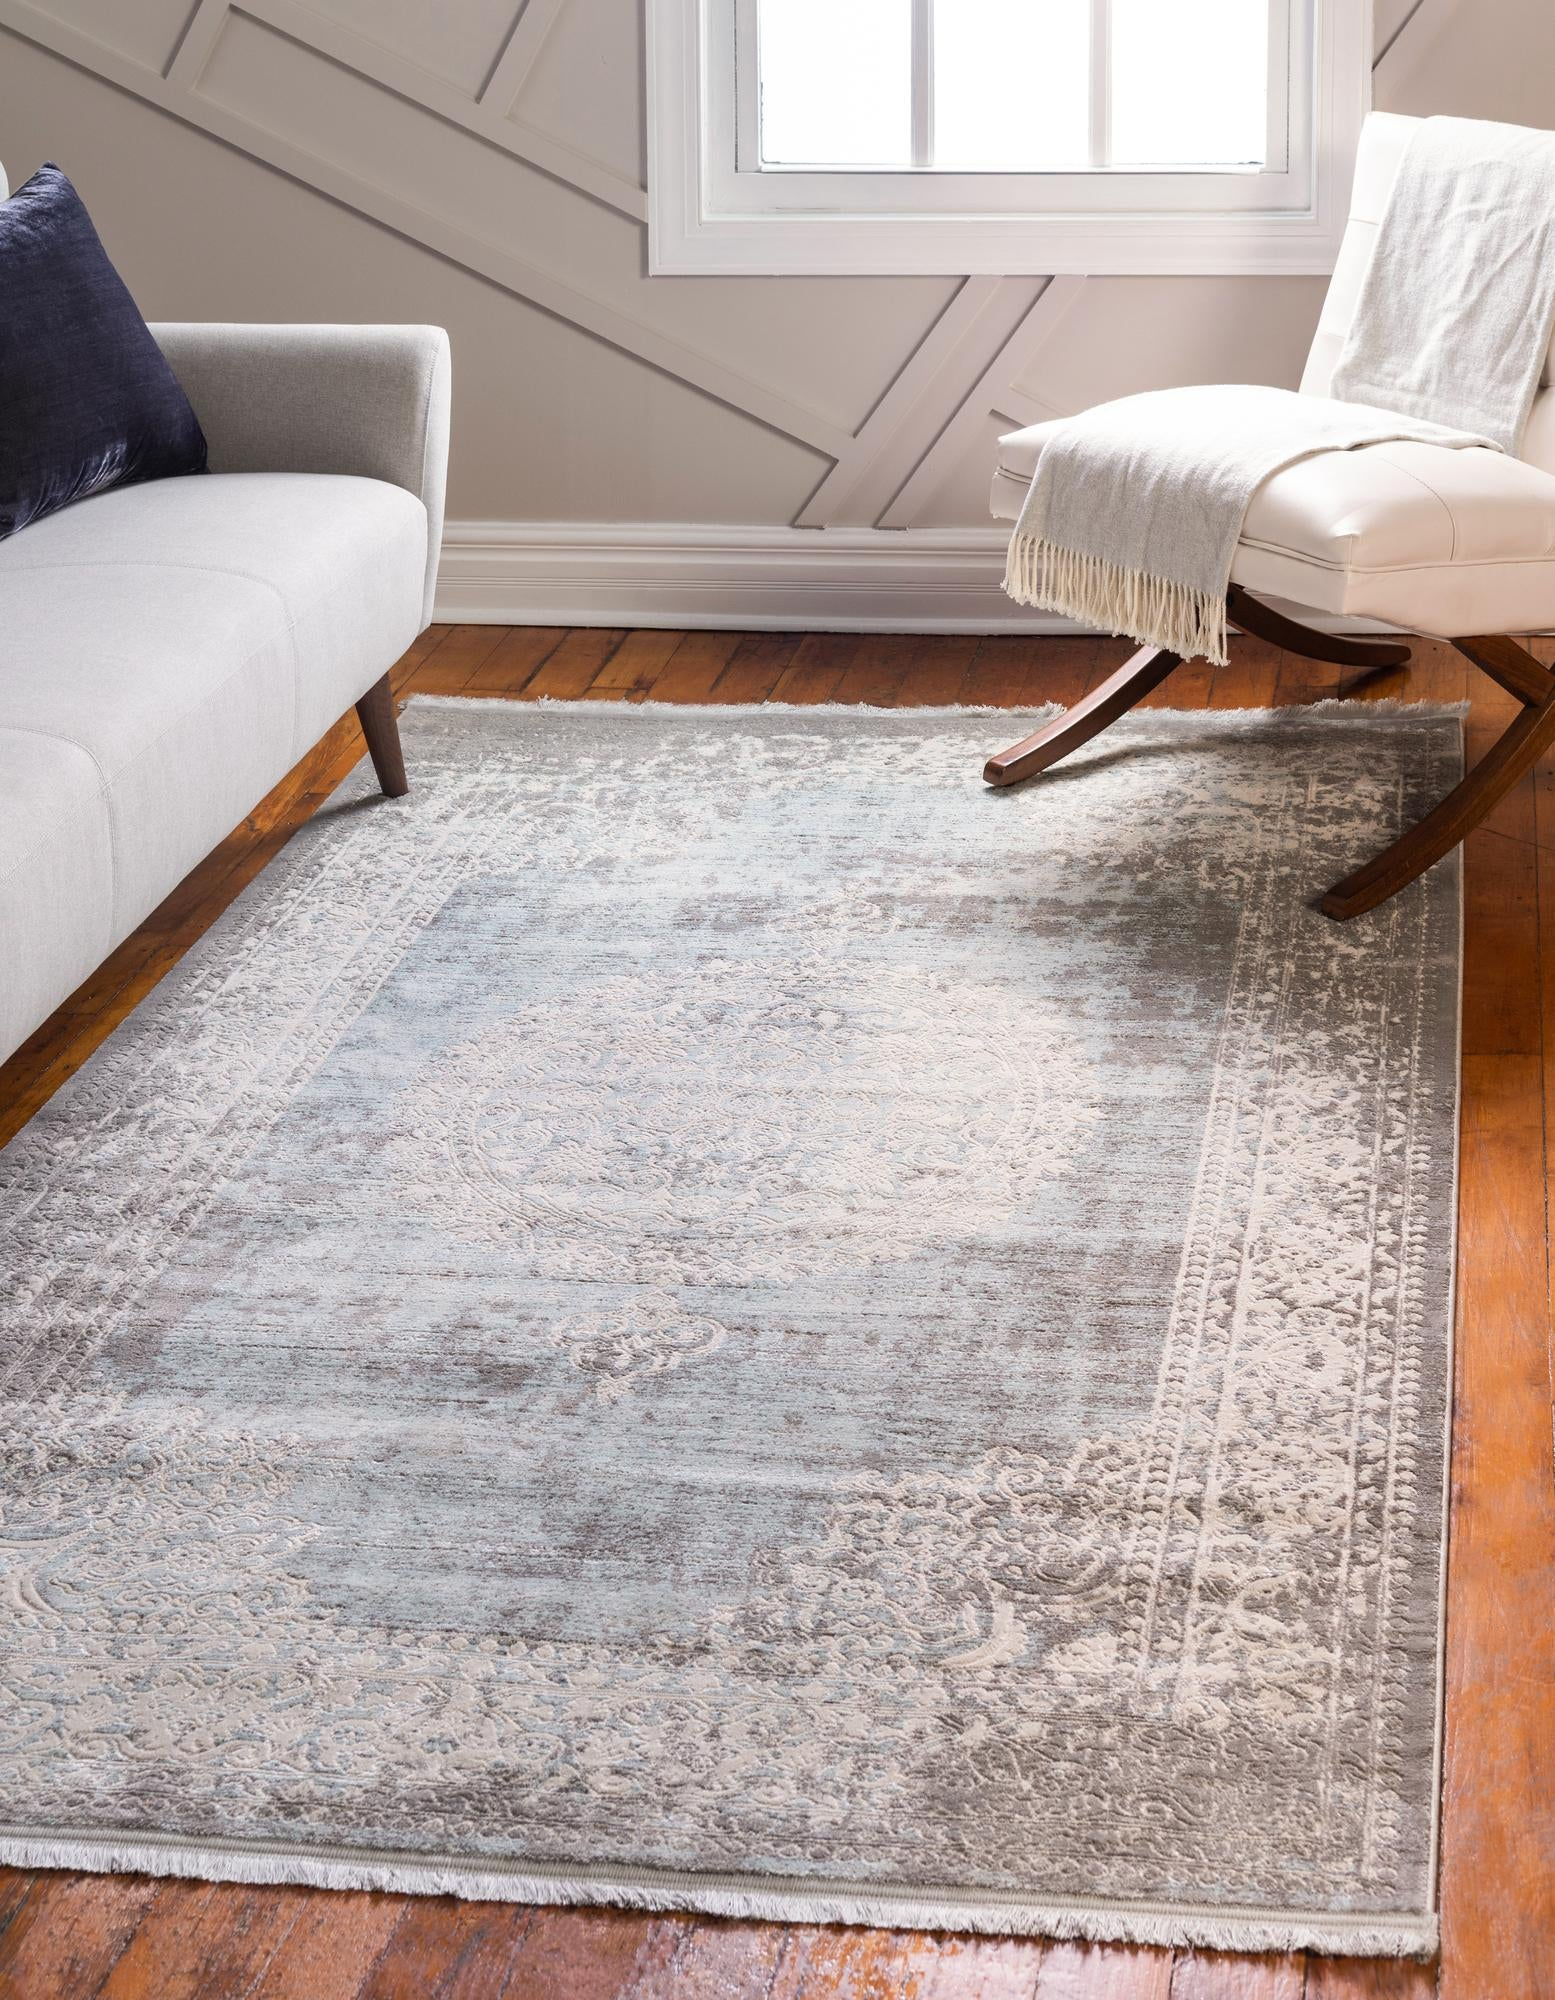 ORIGINAL Designer Rug /'RETRO/' CHEAP Vintage carpets HE184 Flowers beige white